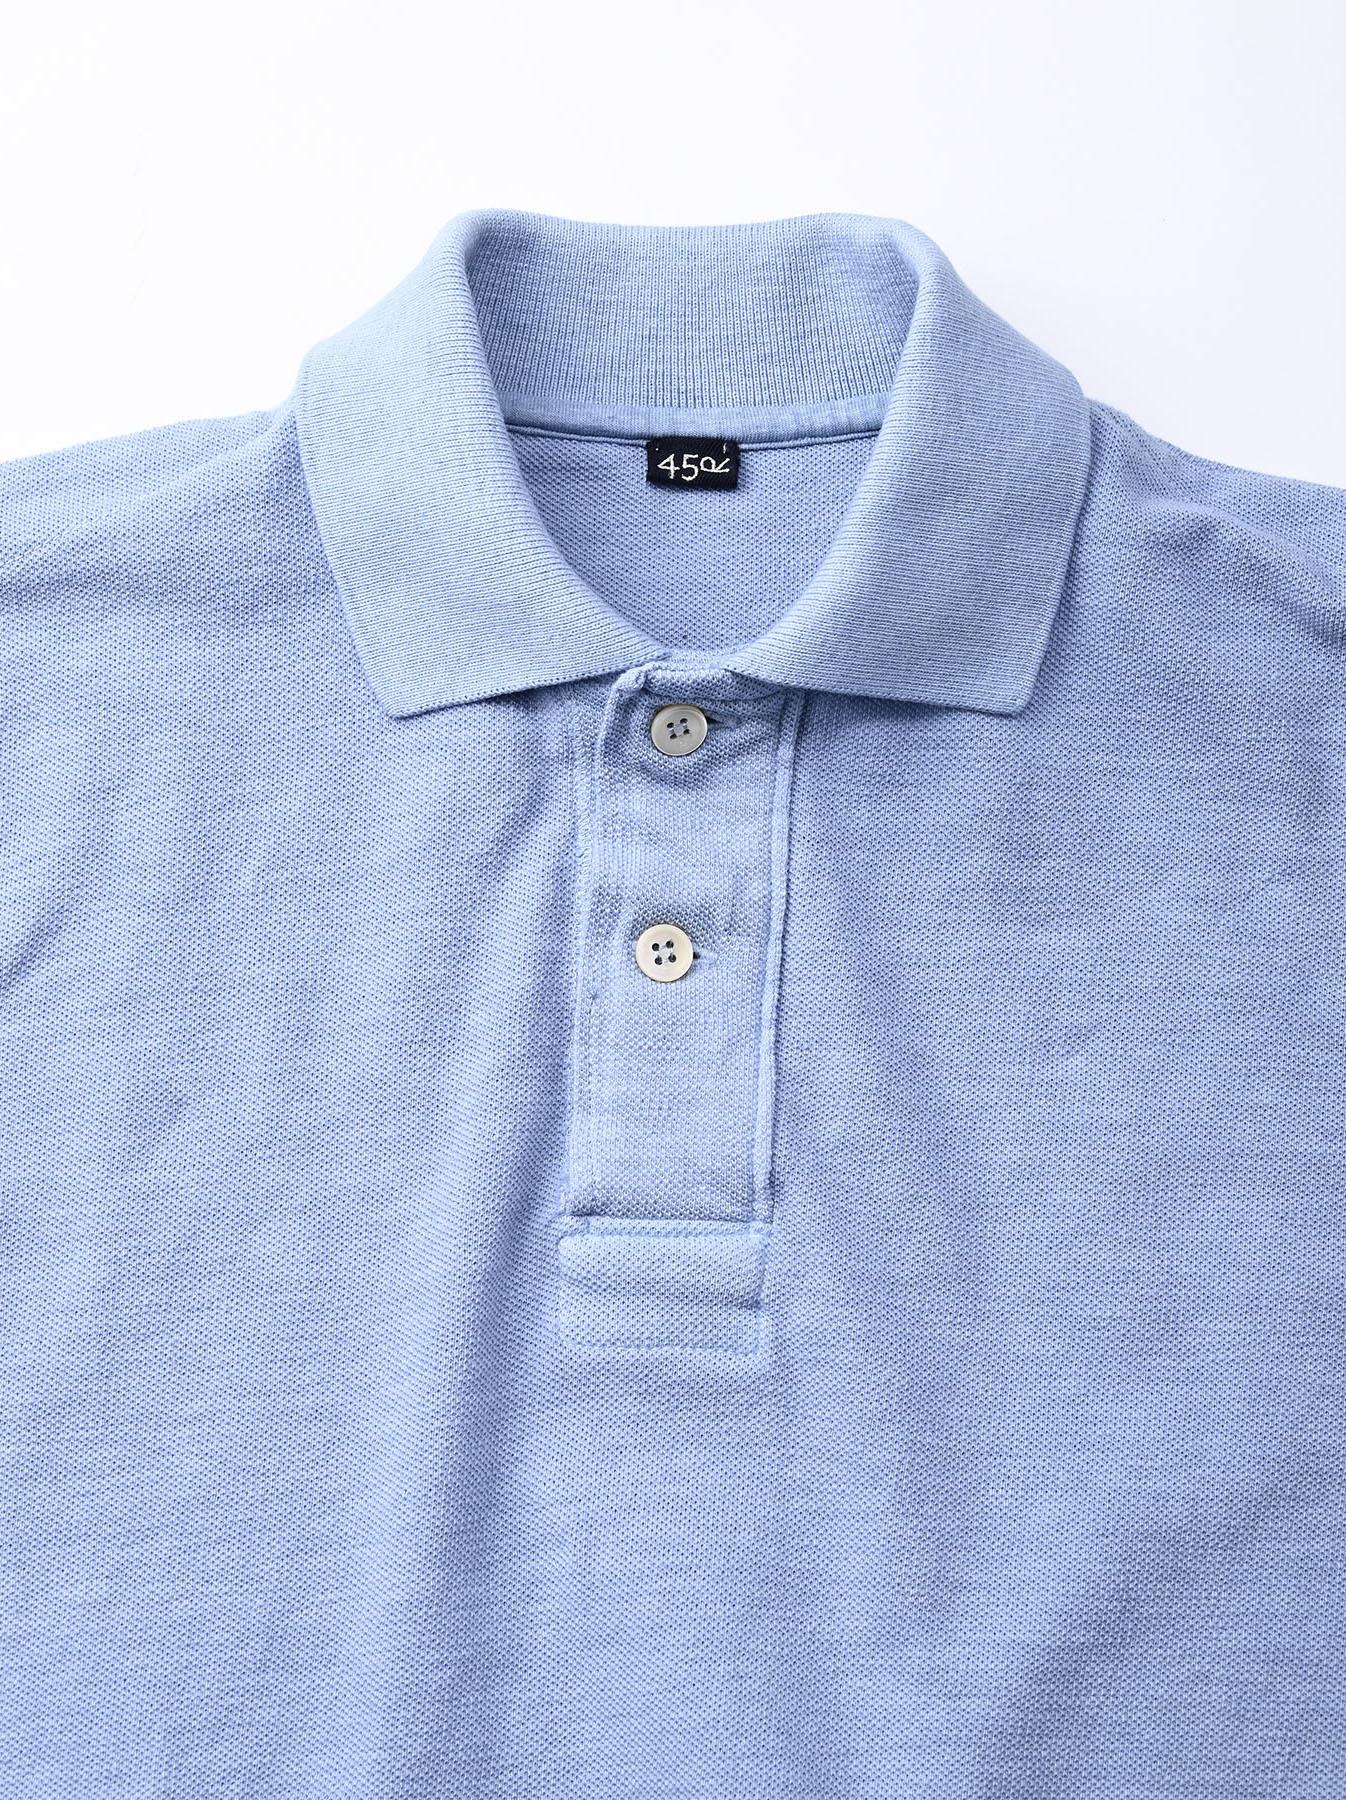 Kanoko Ocean Shiokaze Short-sleeved Polo Shirt (0521)-9